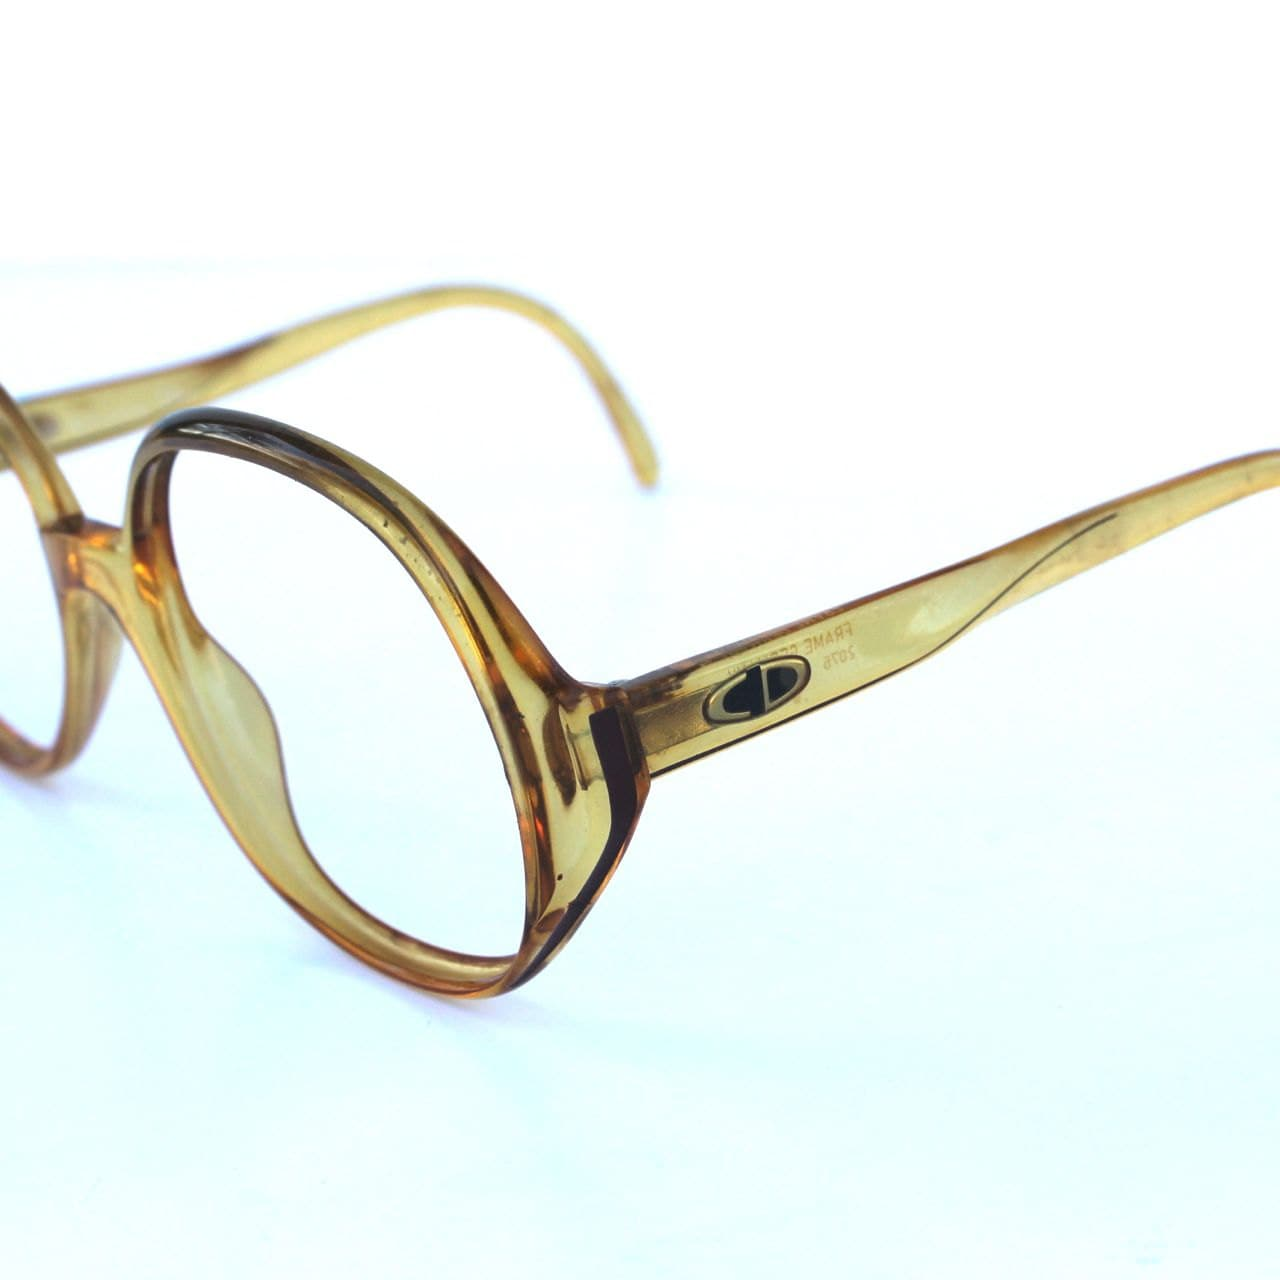 Glasses Frames Christian Dior : Christian Dior Vintage Circular Caramel Glasses Frames ...